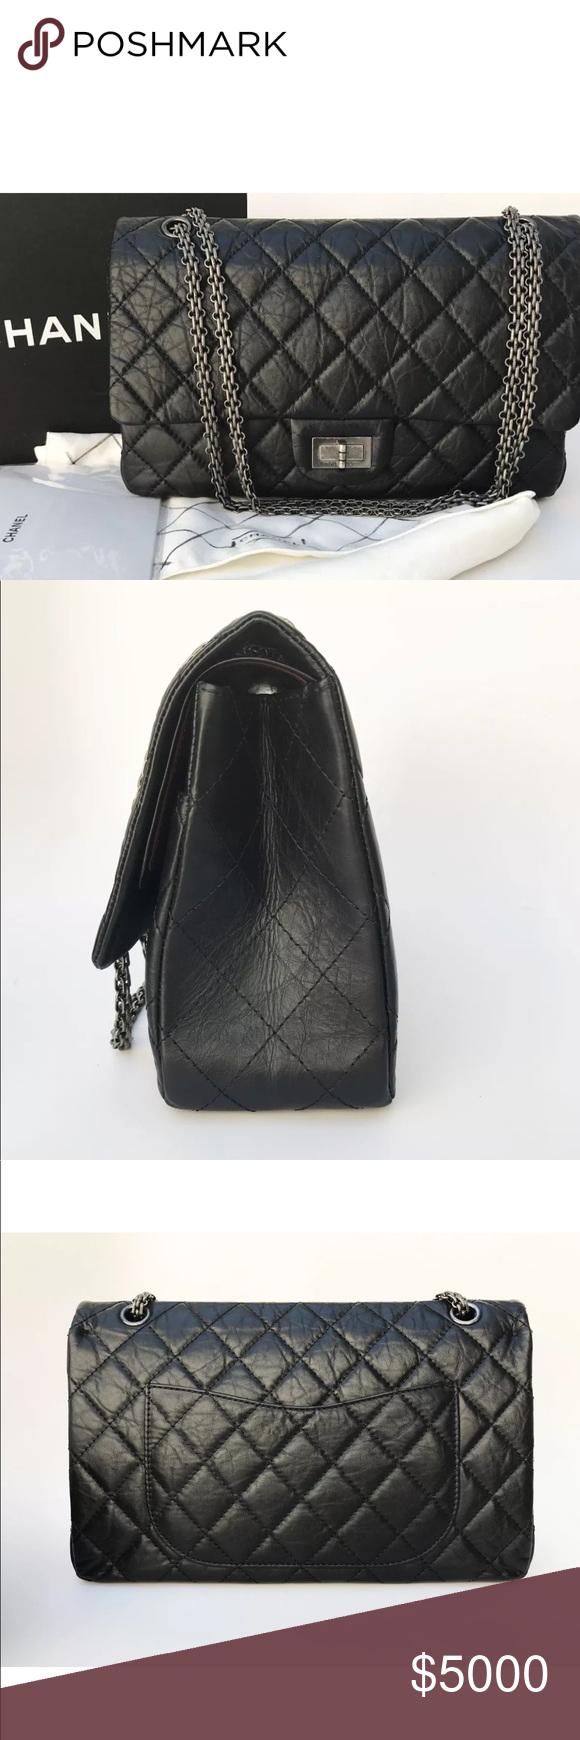 Chanel handbag 😍😍 CHANEL Bags